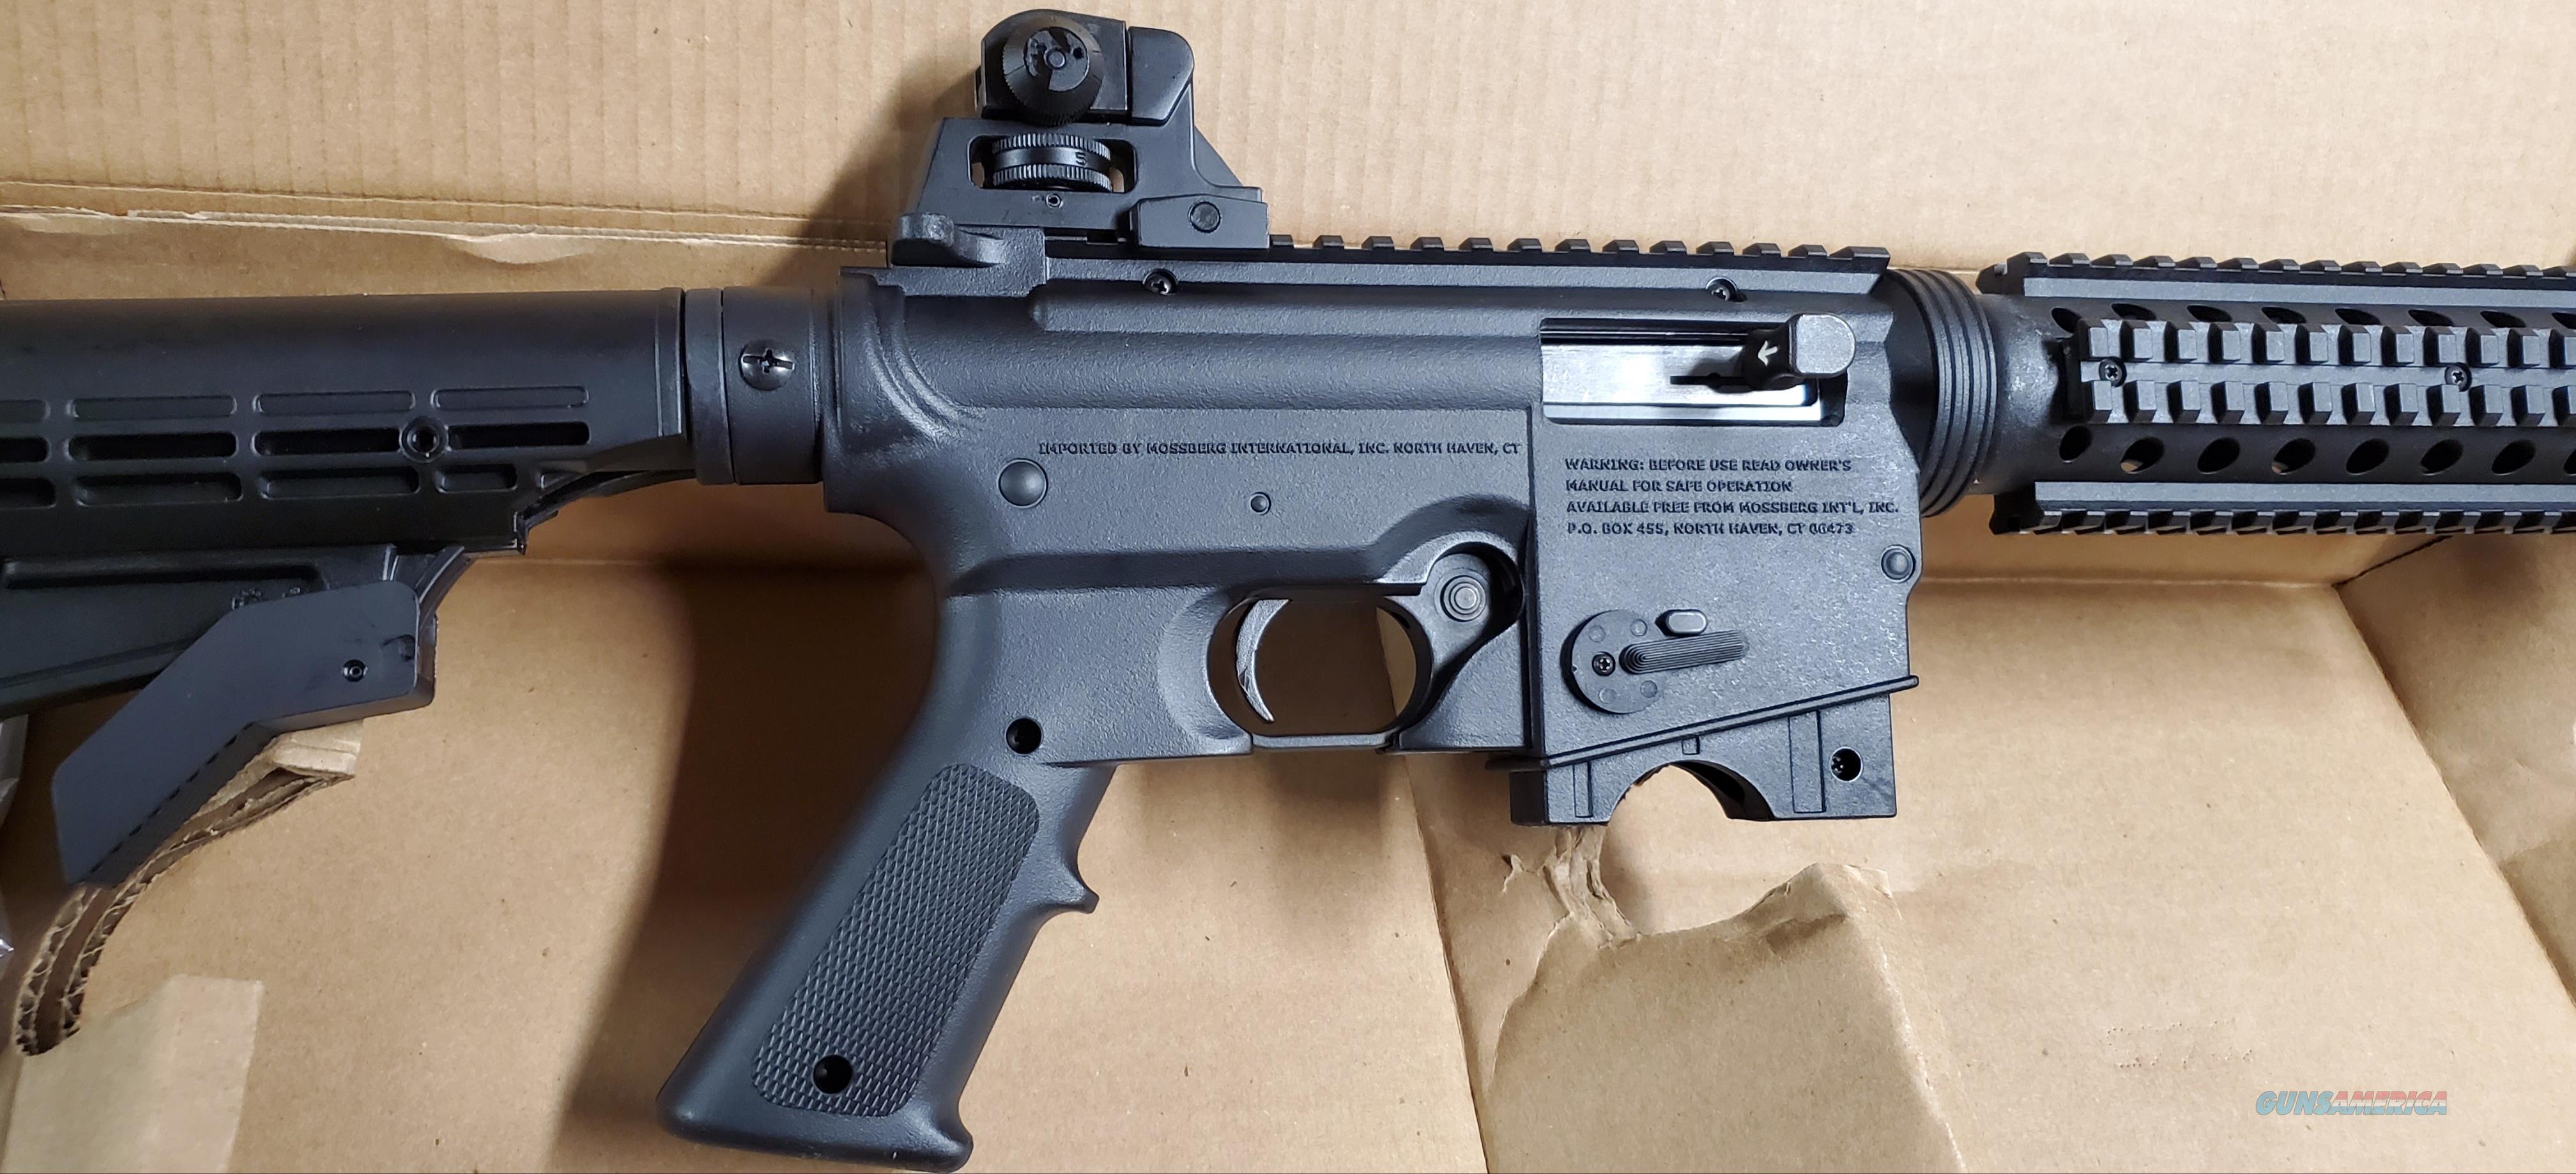 Mossberg Int'l 715T Flat Top 25-Round 22 LR  New!  LAYAWAY OPTION  37209  Guns > Rifles > Mossberg Rifles > 715